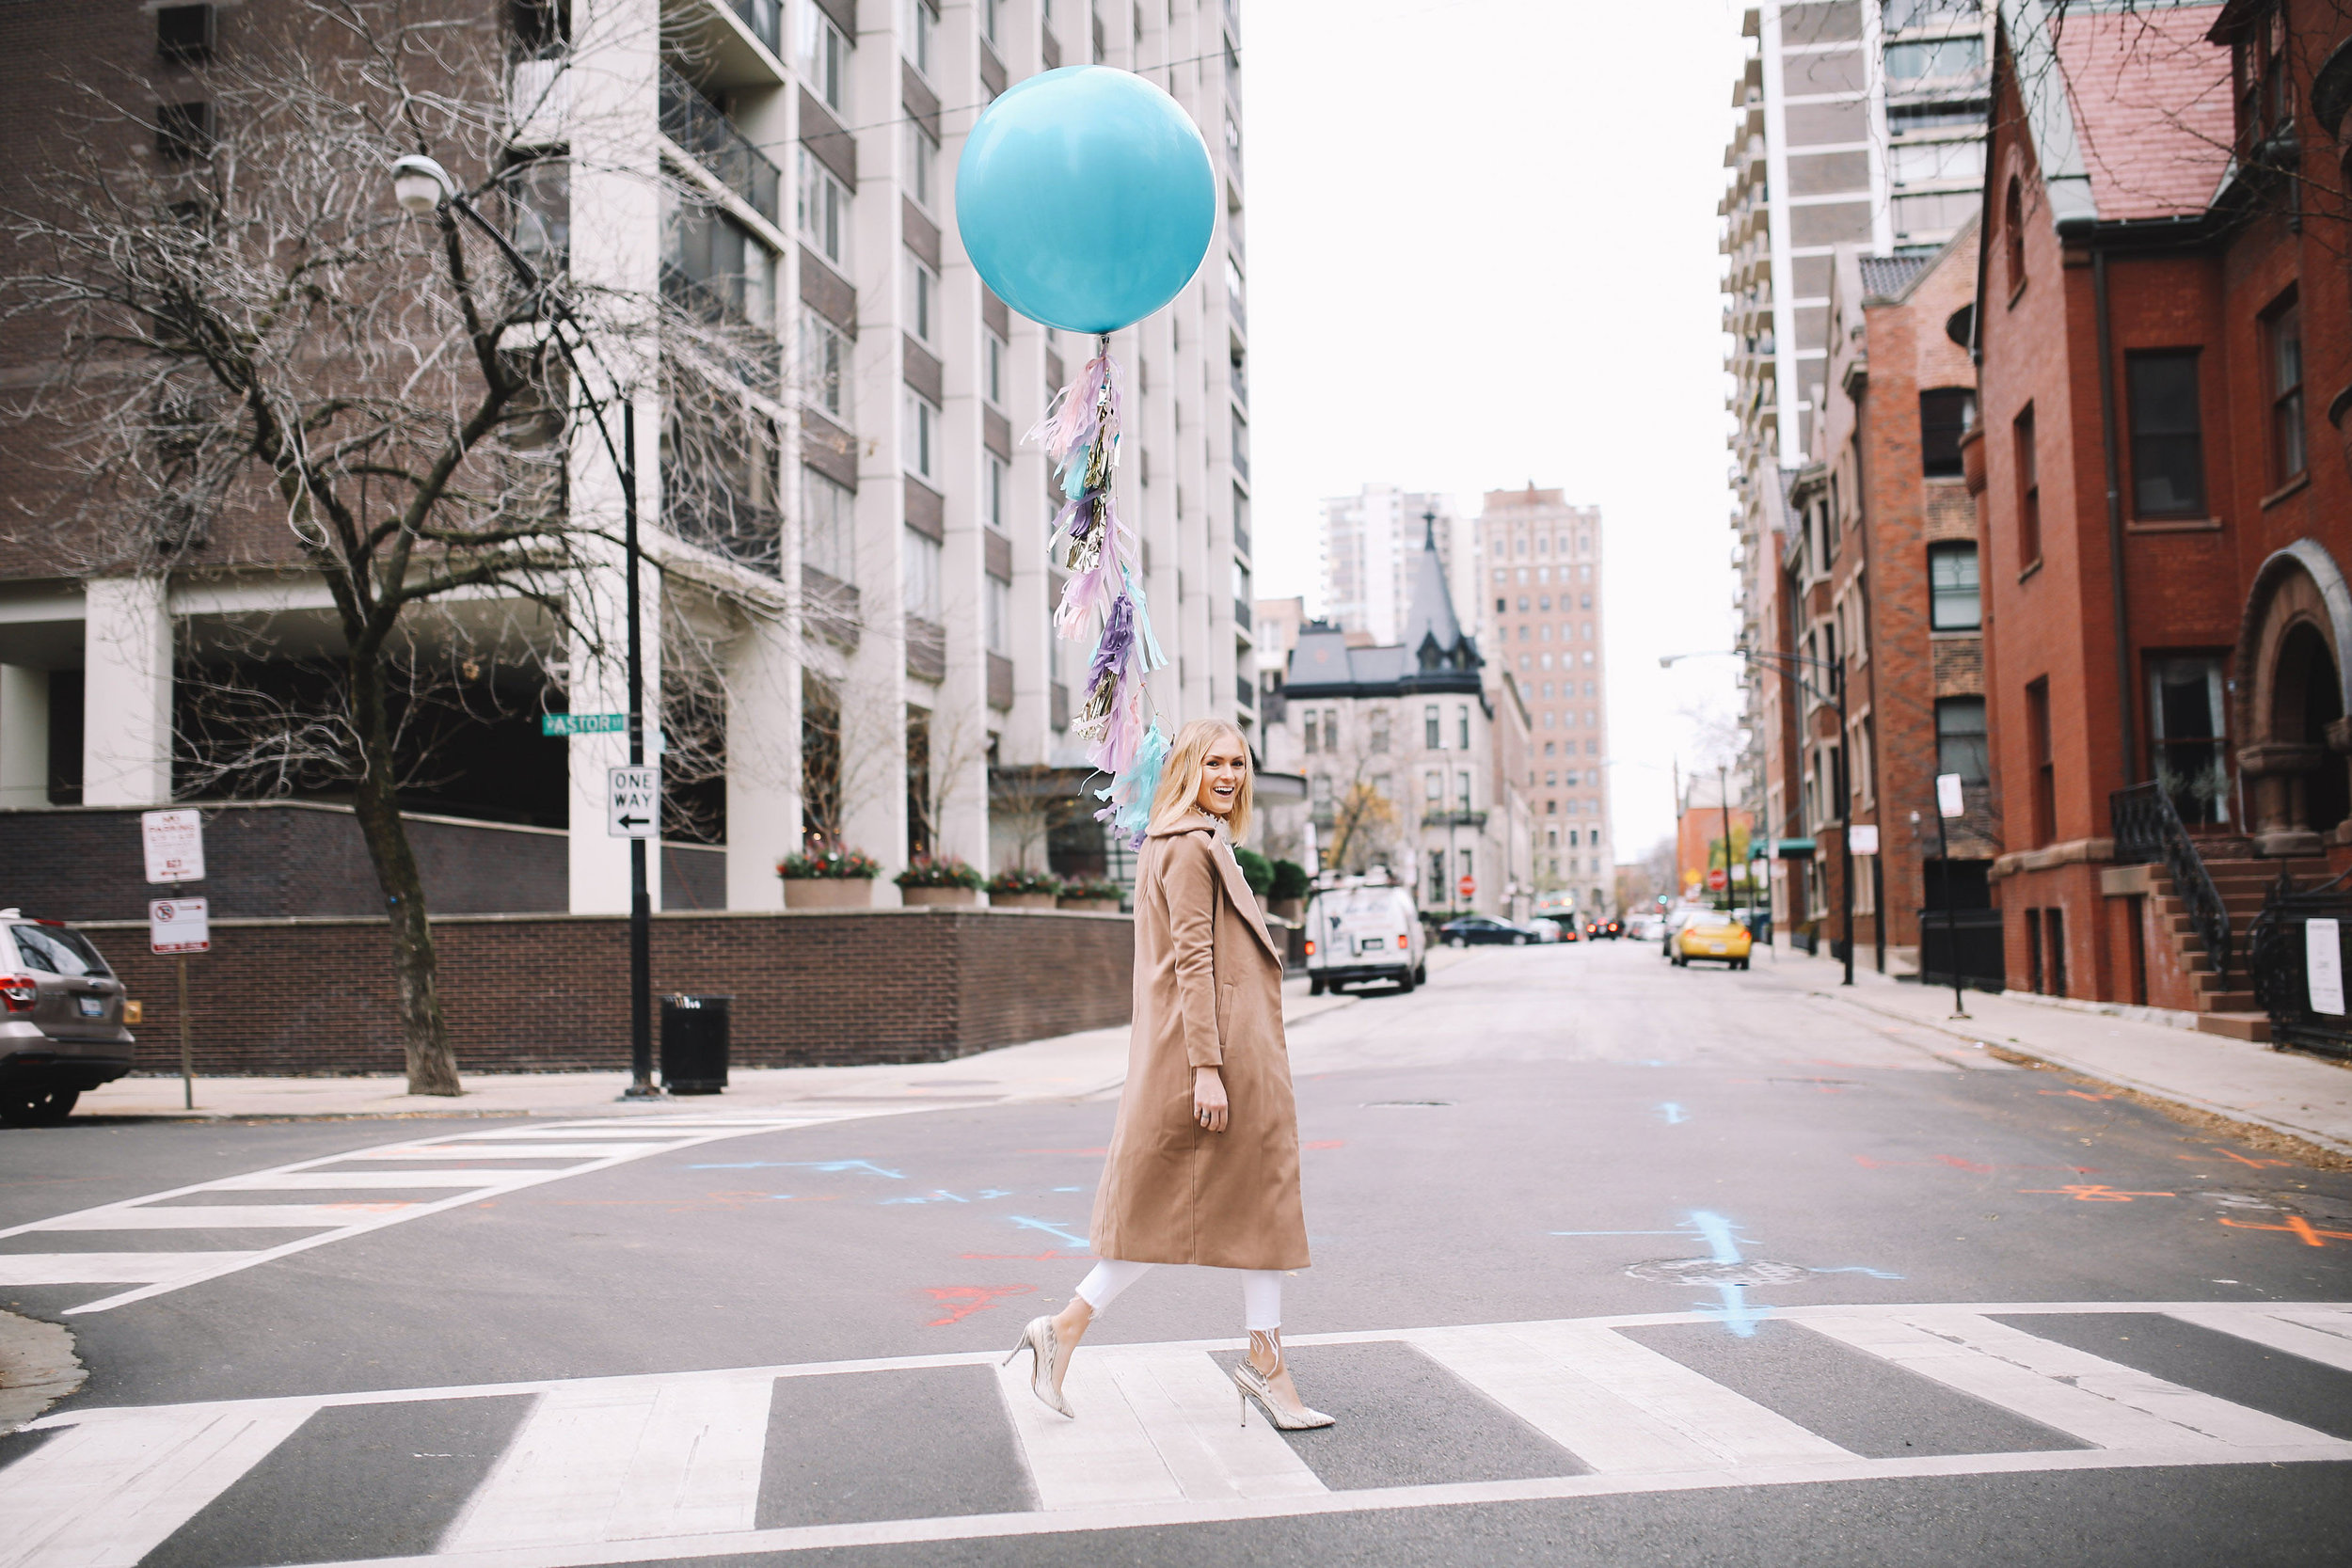 camel-coat-fun-balloon